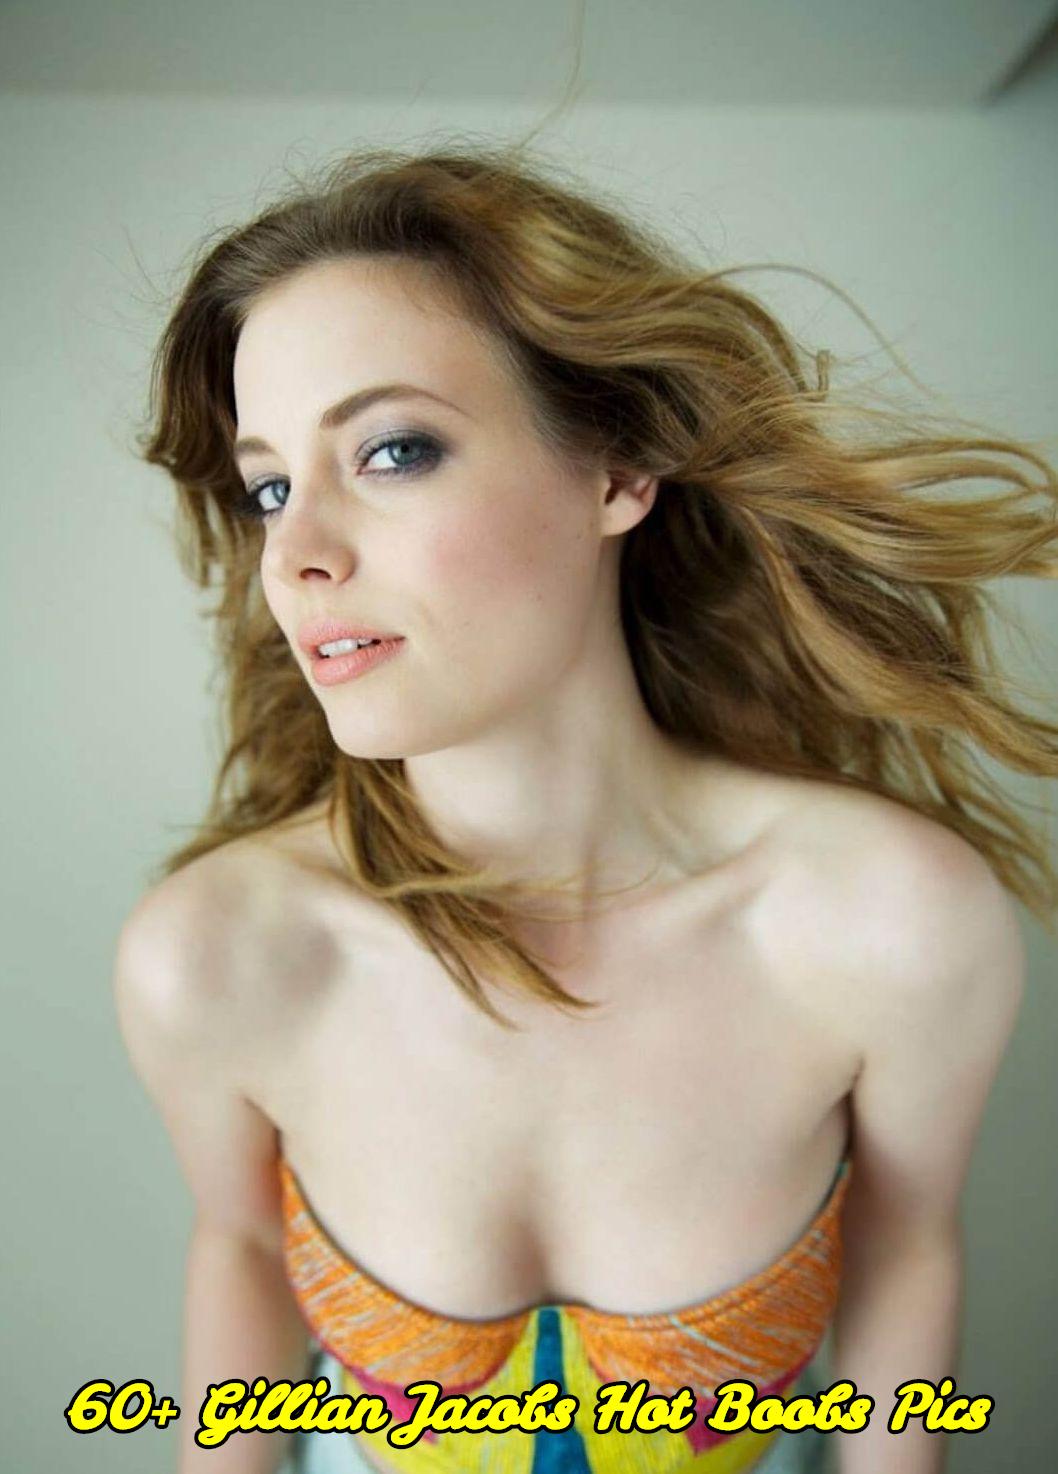 Gillian Jacobs hot boobs pics